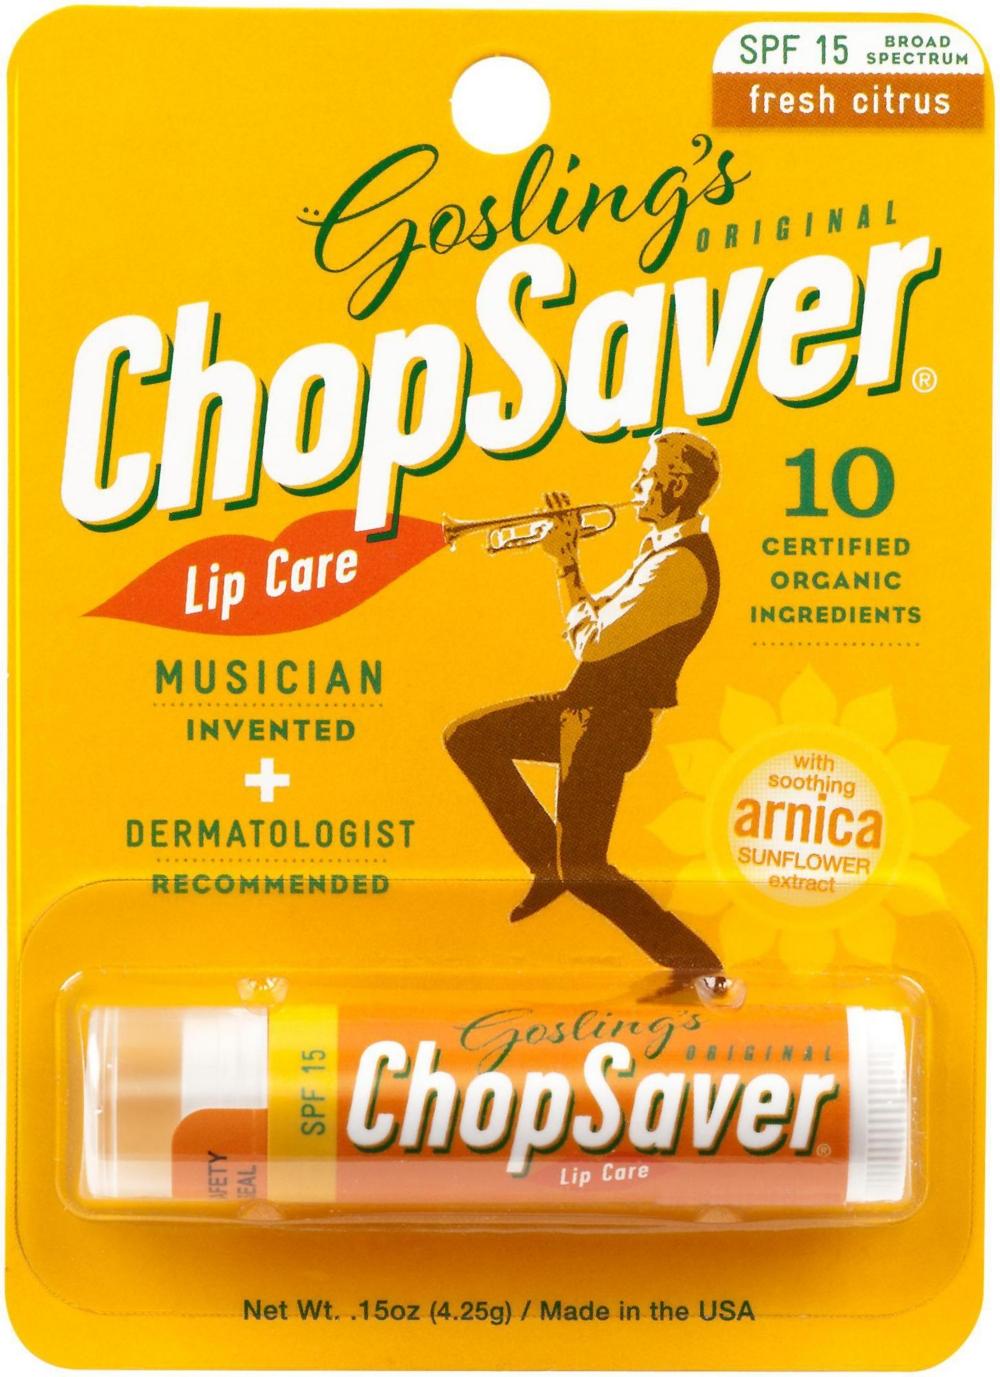 ChopSaver Lip Balm with SPF15 Sunscreen - $1.55 + FS at Amazon